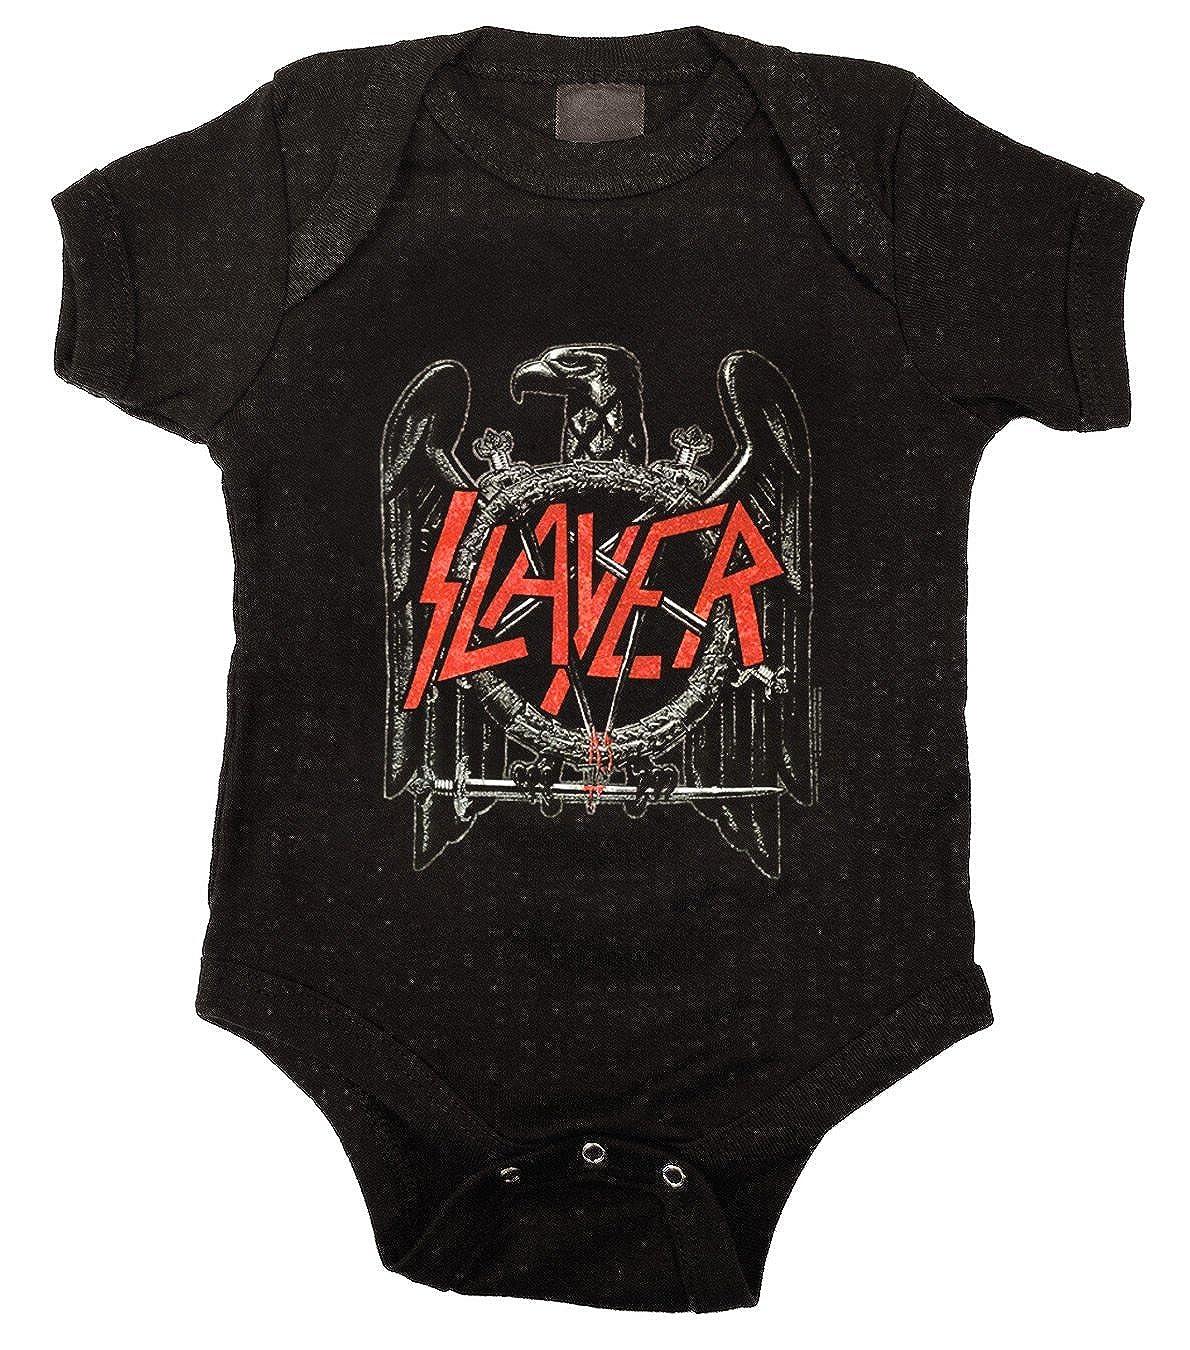 81a2850a Kiditude Unisex-baby Slayer Eagle Onesie Bodysuit Romper: Amazon.ca ...